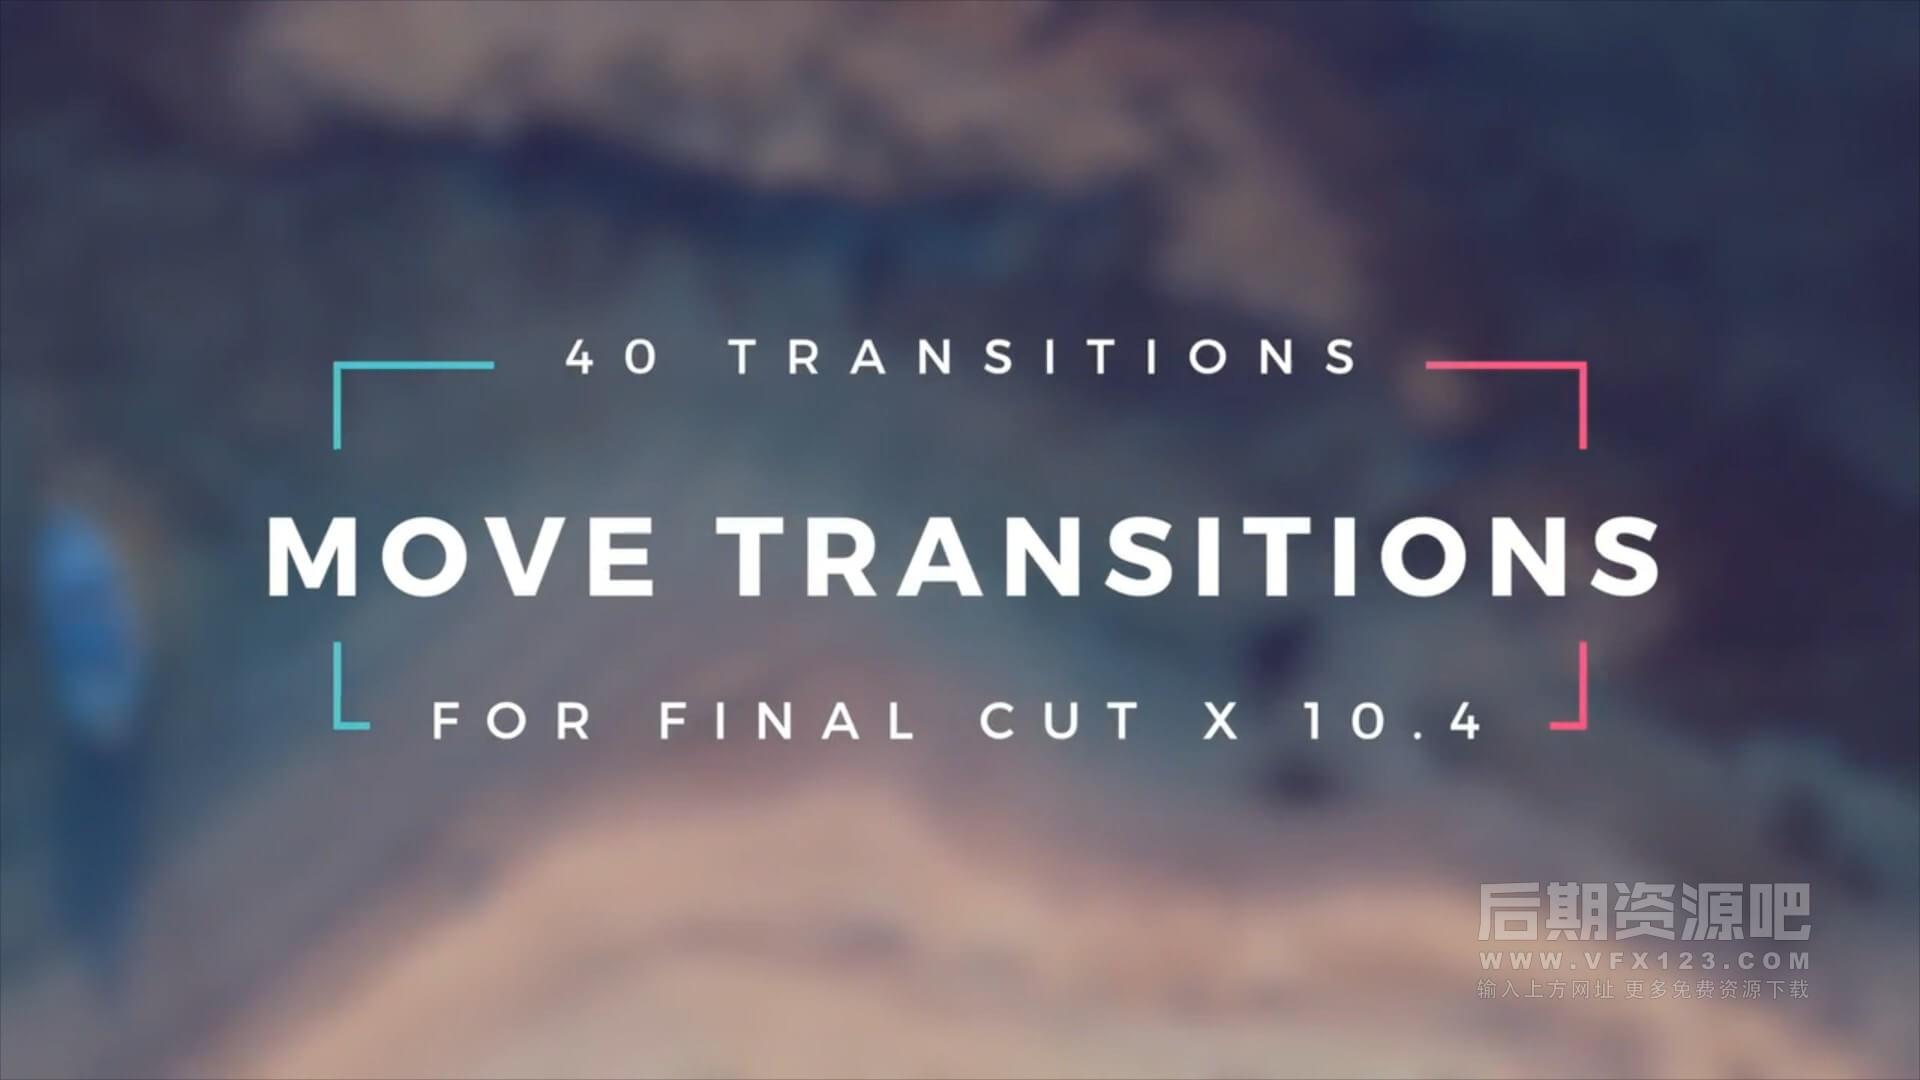 Fcpx转场插件 40组相机镜头运动推拉摇移过渡转场 Move Transitions